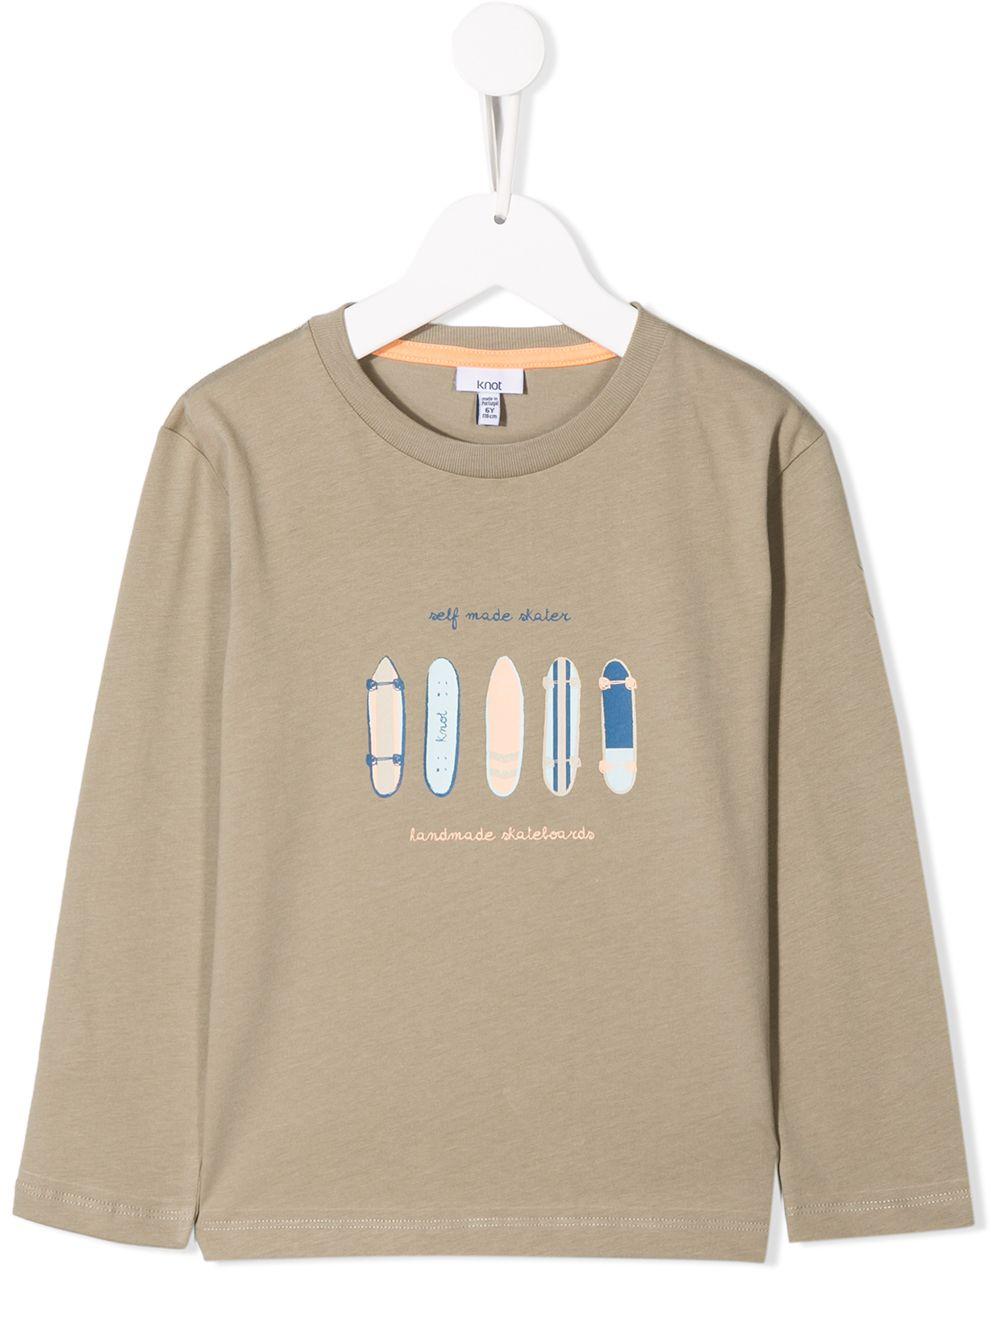 Knot | Knot футболка с длинными рукавами | Clouty